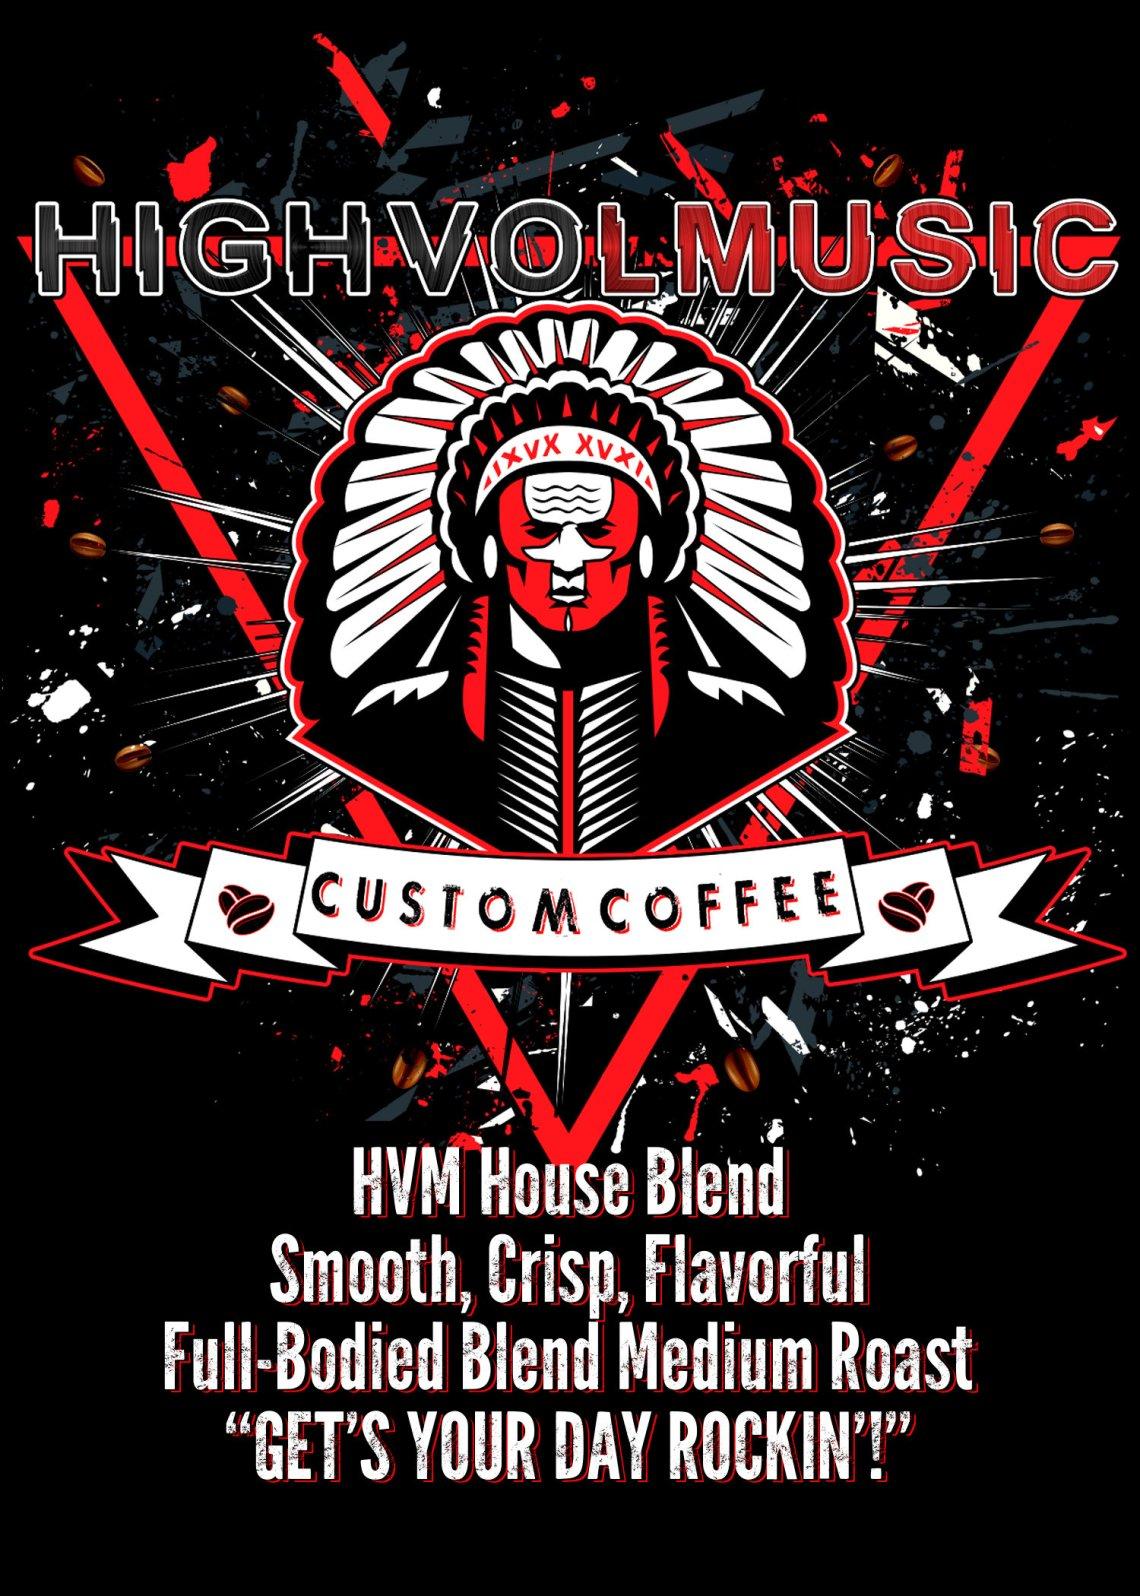 HVM Signature 'House Blend' Coffee HVMHBC